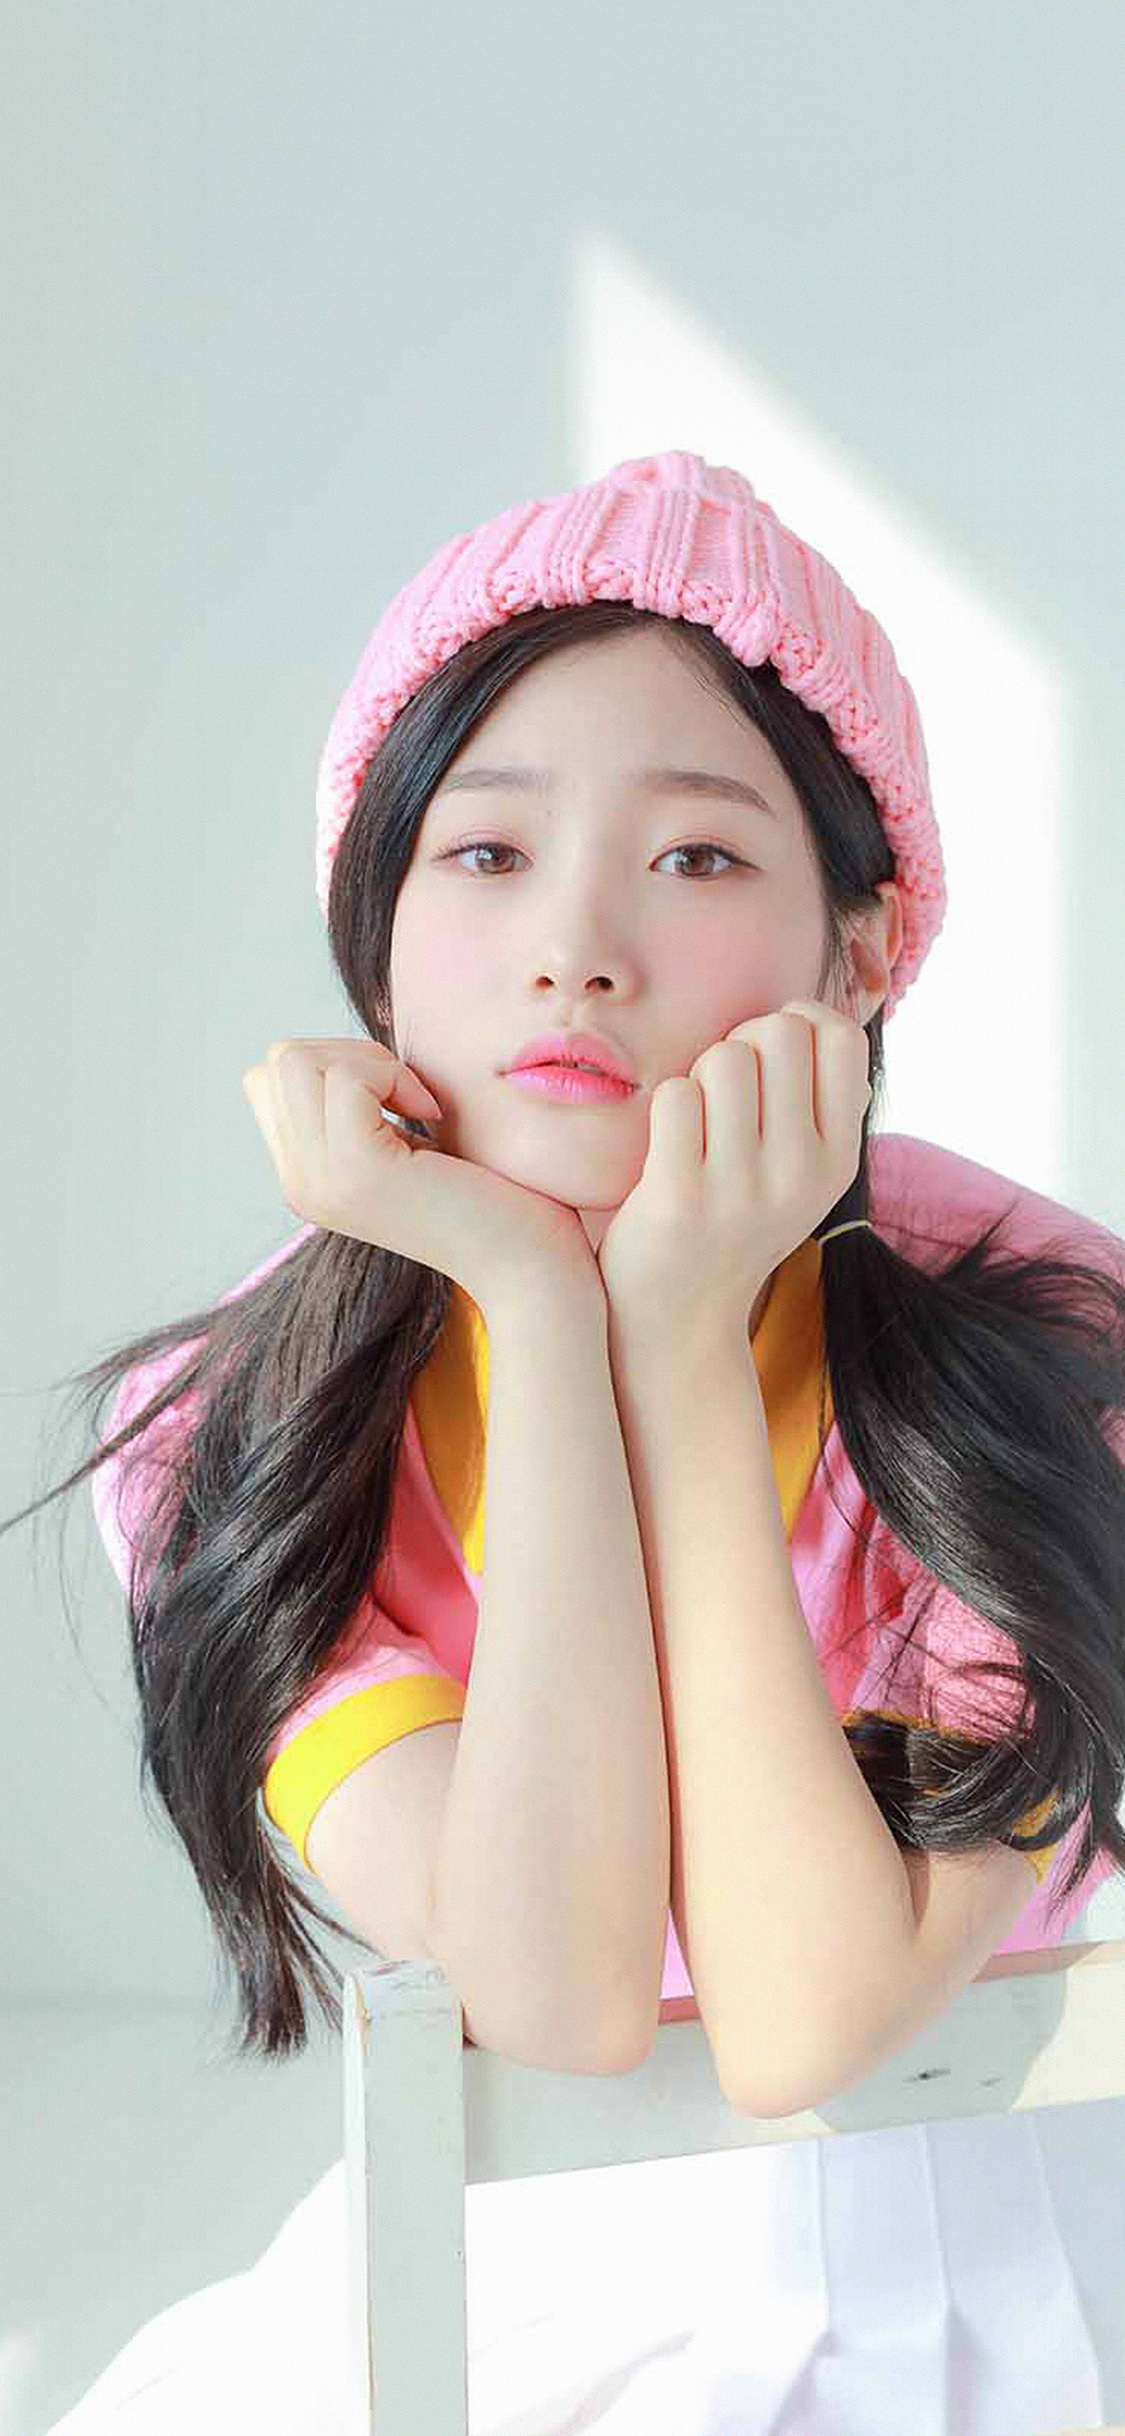 Droid X Girl Wallpaper Hm45 Ioi Chaeyeon Girl Pink White Asian Wallpaper